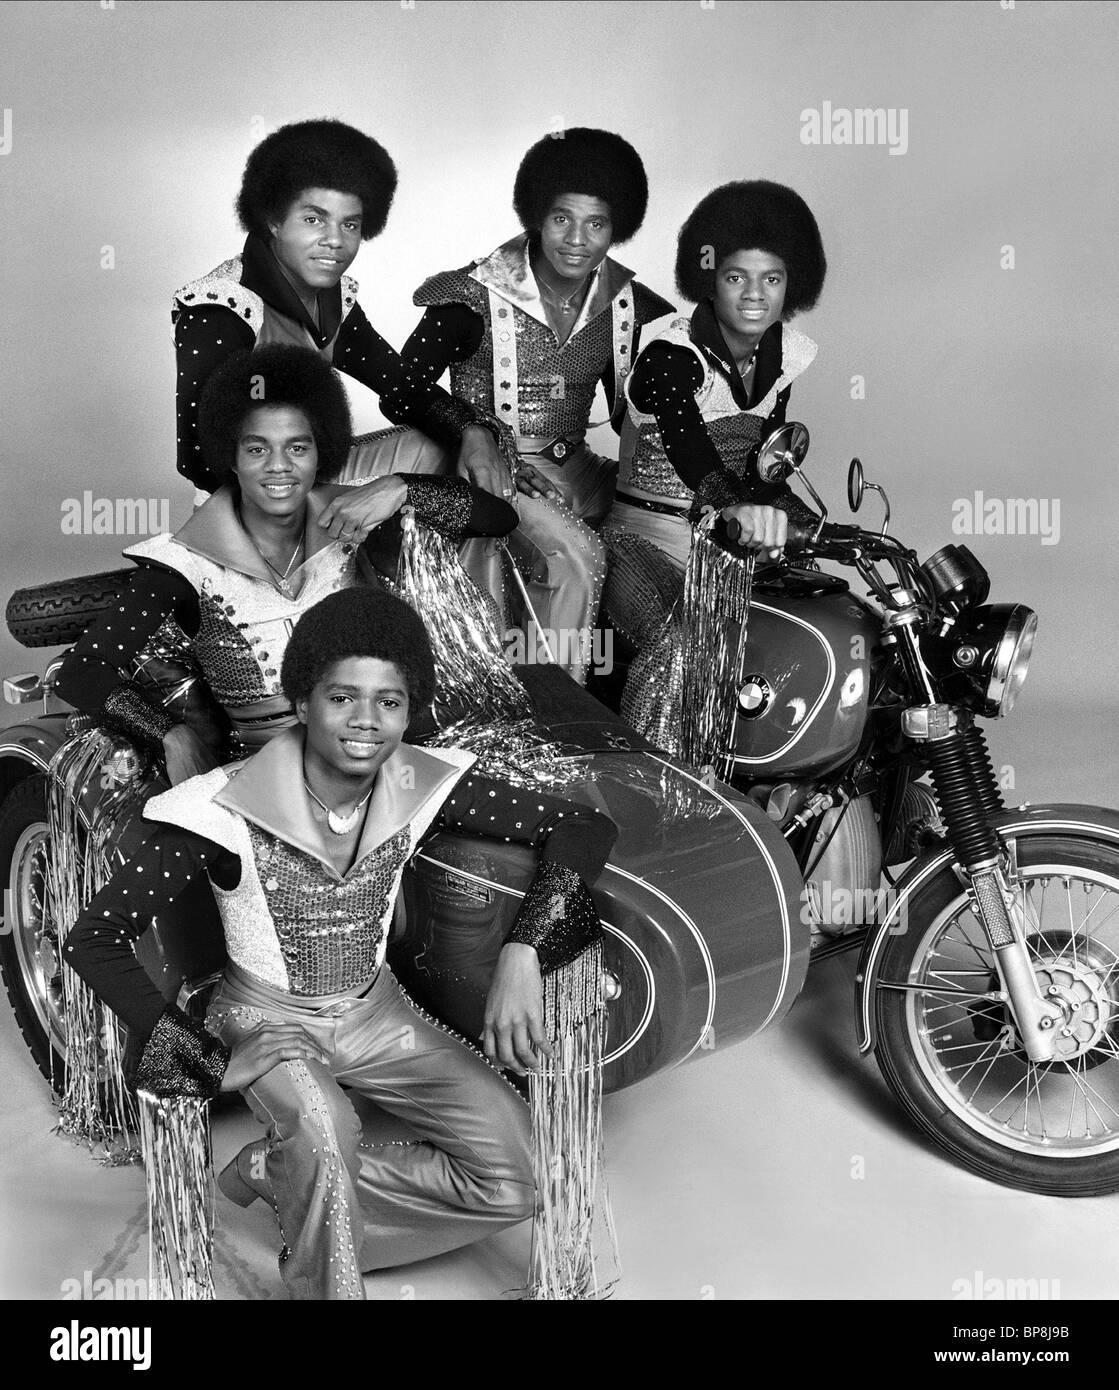 RANDY Jackson, Marlon Jackson, Tito Jackson, Jackie Jackson et MICHAEL JACKSON THE JACKSONS (1977) Photo Stock